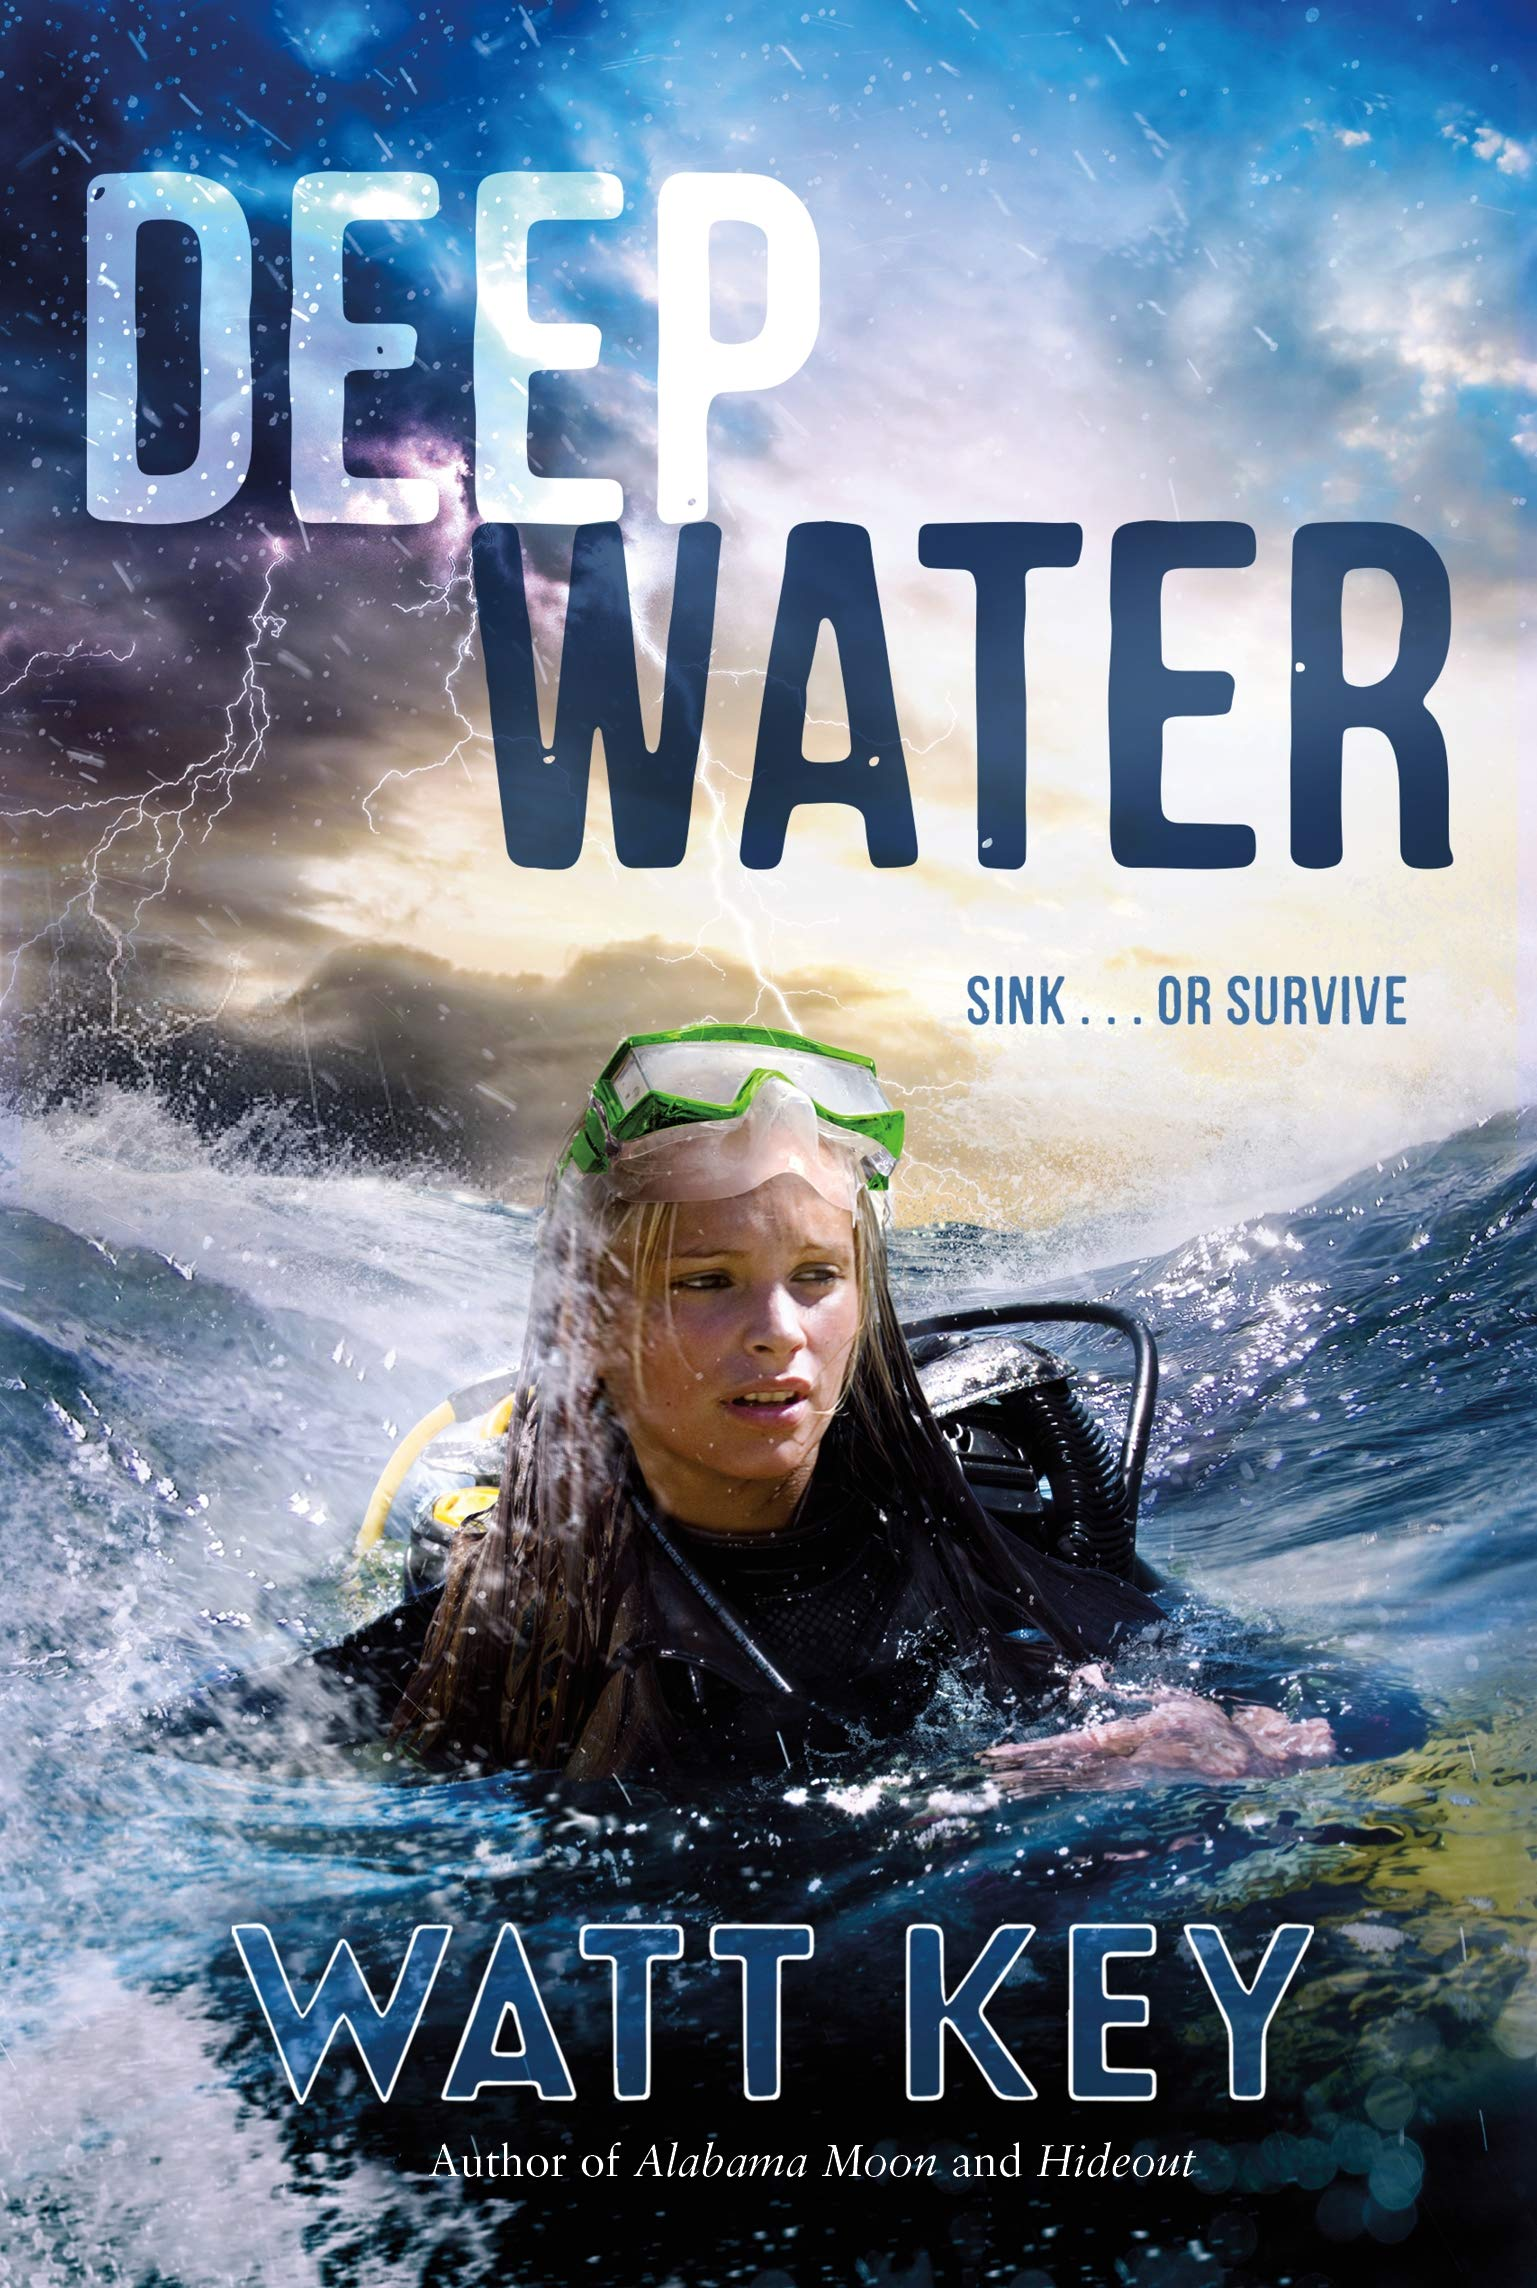 Deep Water: Key, Watt: 9780374306540: Amazon.com: Books